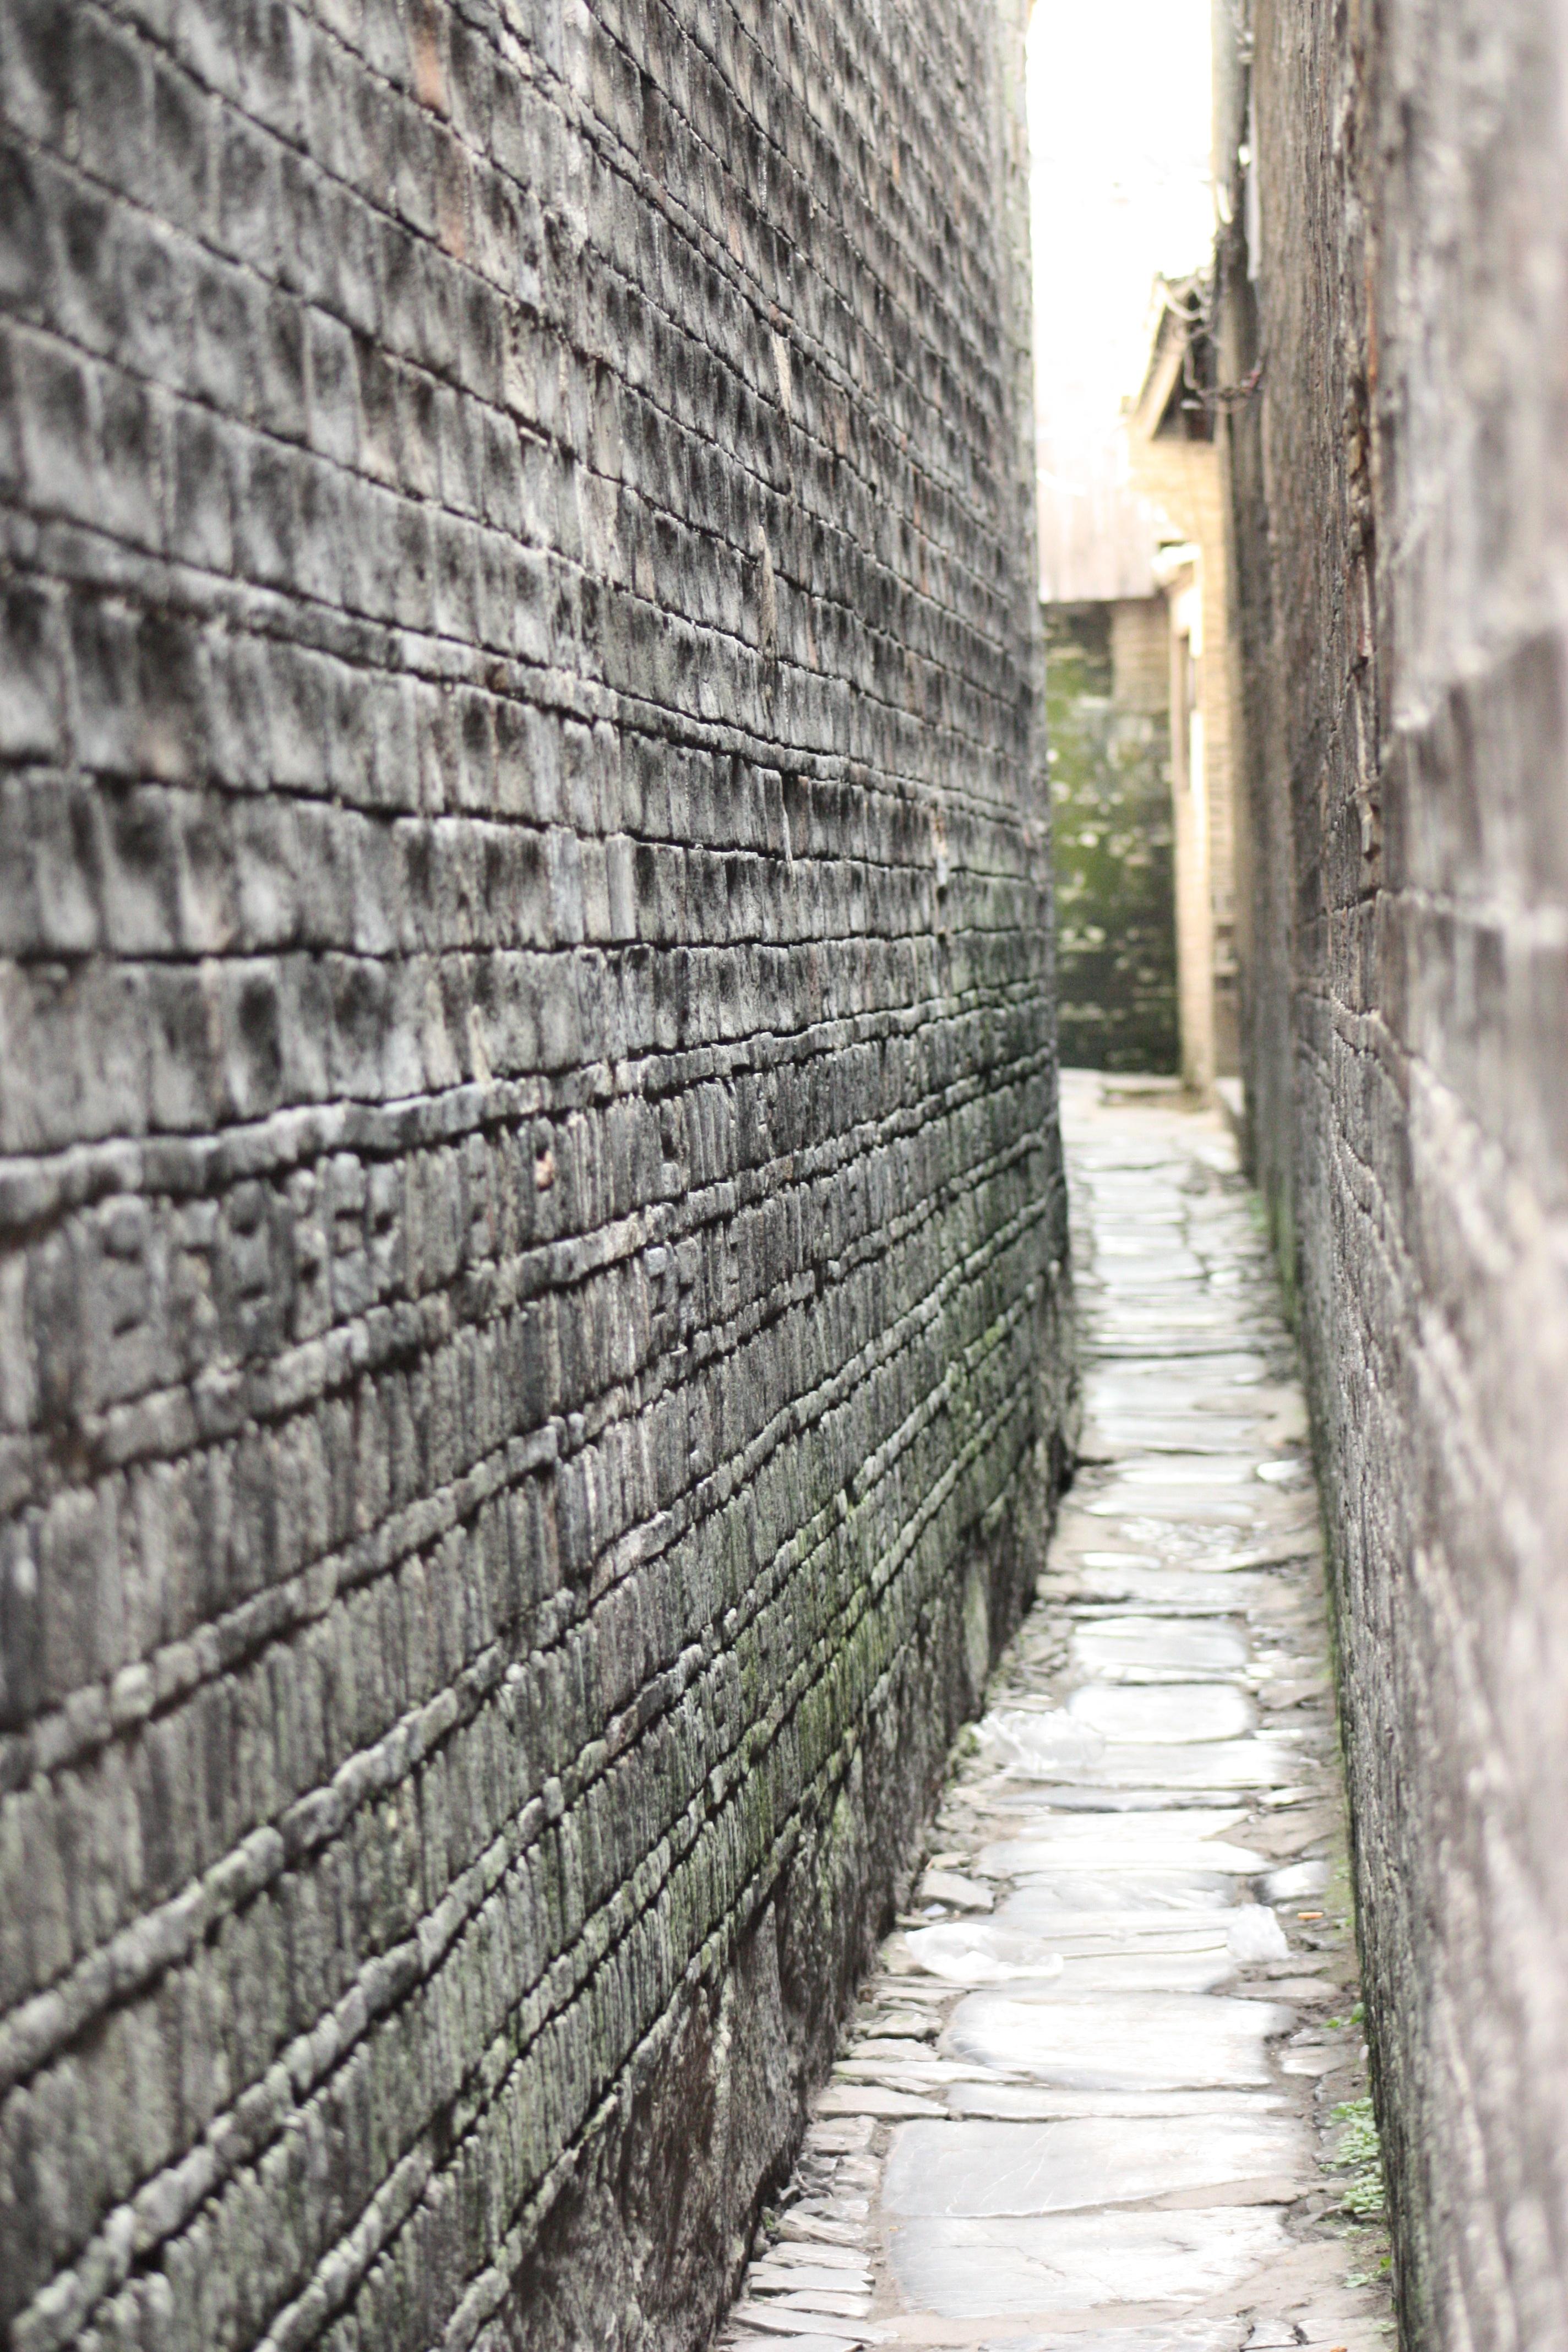 Tree Winter Wood Road Street Sidewalk Alley Cobblestone Wall Narrow Alleyway Brick Lane Material Infrastructure China